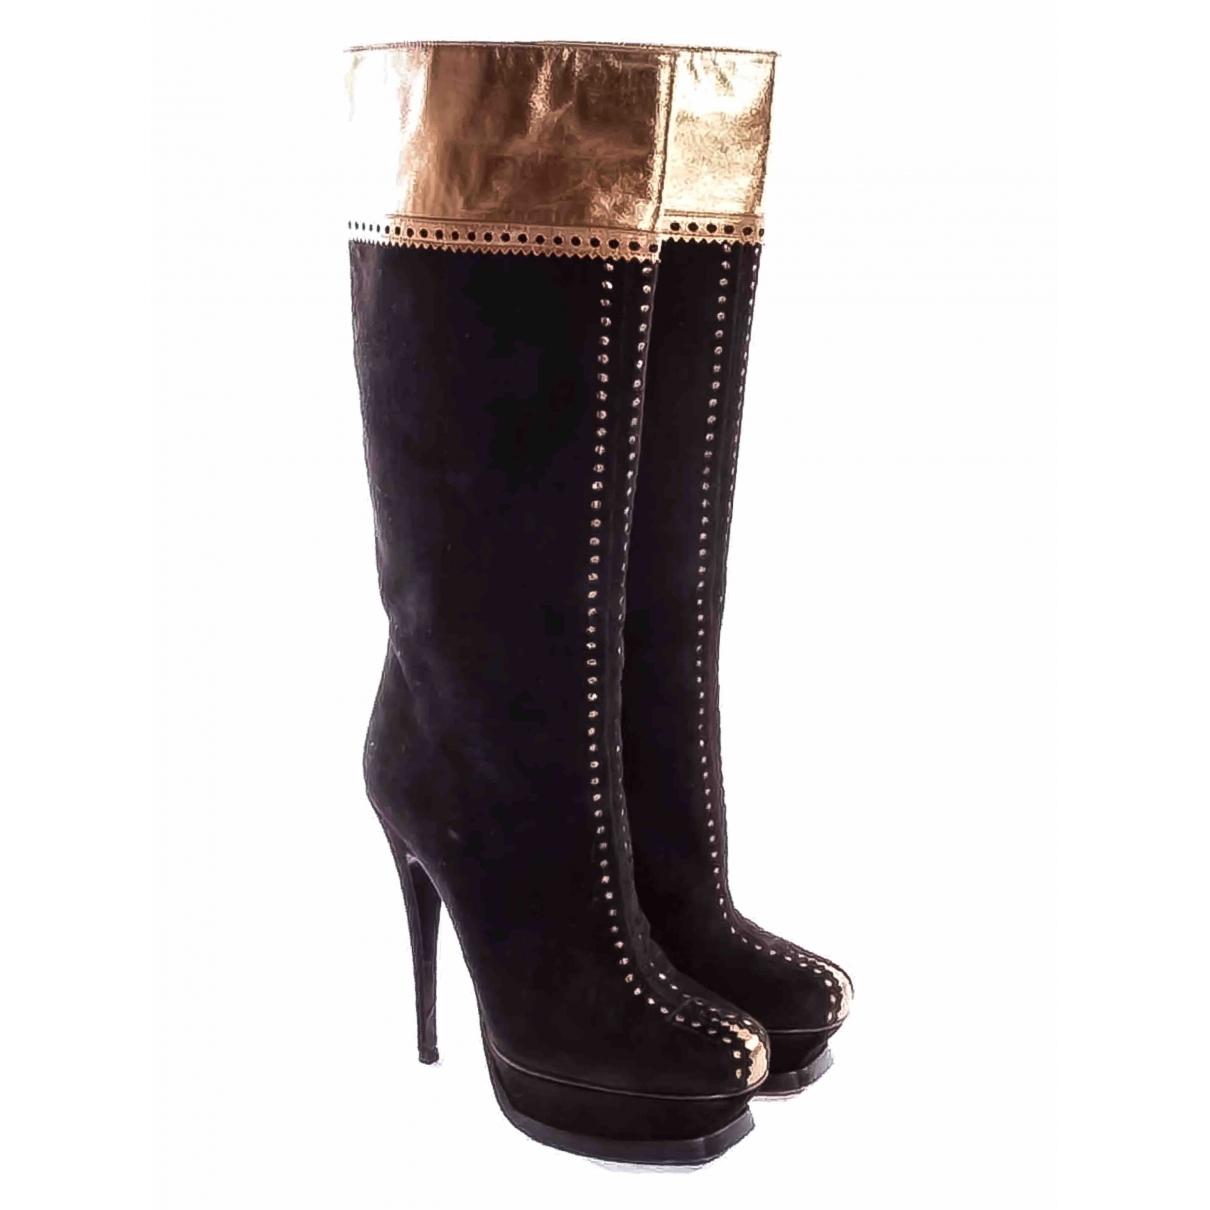 Yves Saint Laurent \N Black Suede Boots for Women 37.5 EU